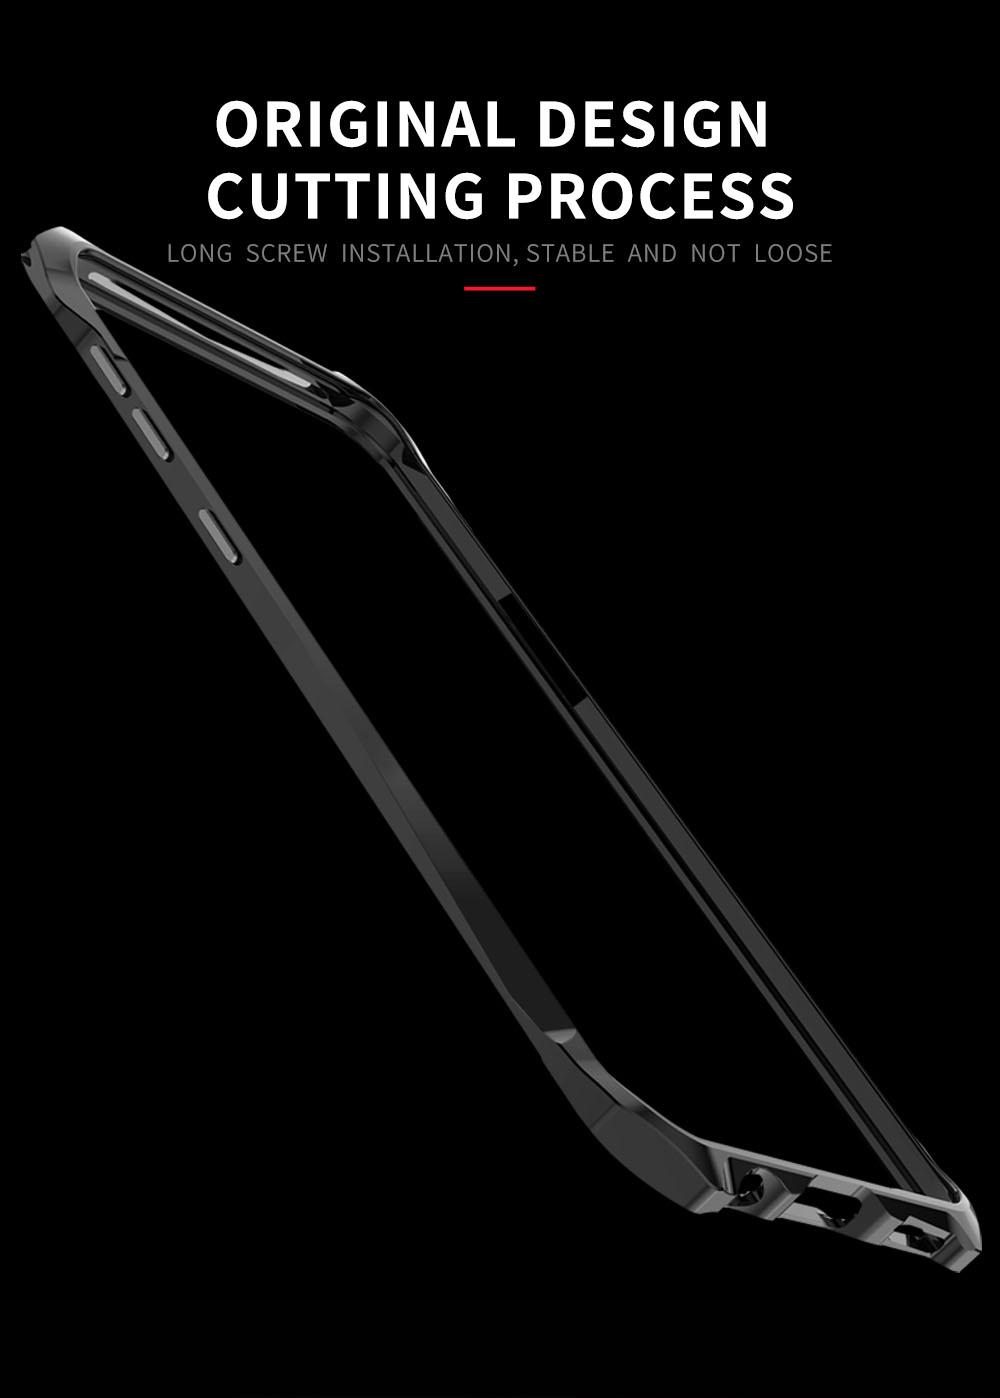 Samsung S9/S9 Plus case